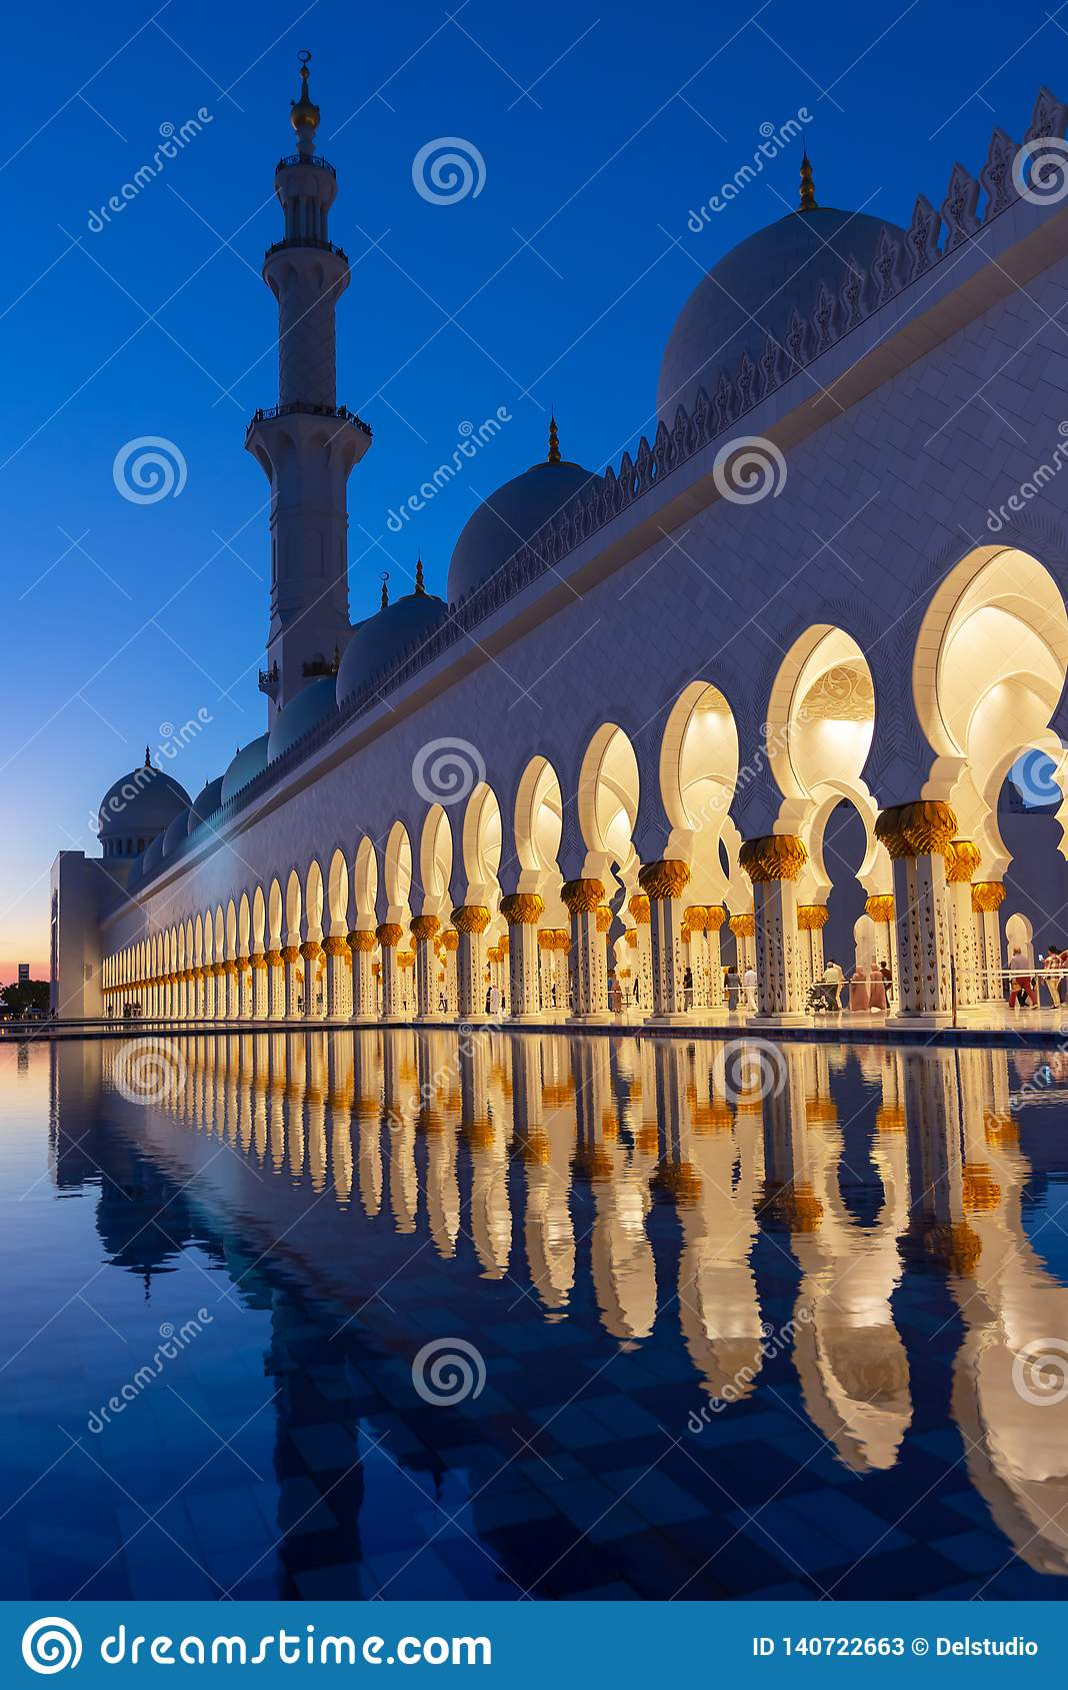 Sheikh Zayed Grand Mosque in Abu Dhabi near Dubai illuminated at night, UAE